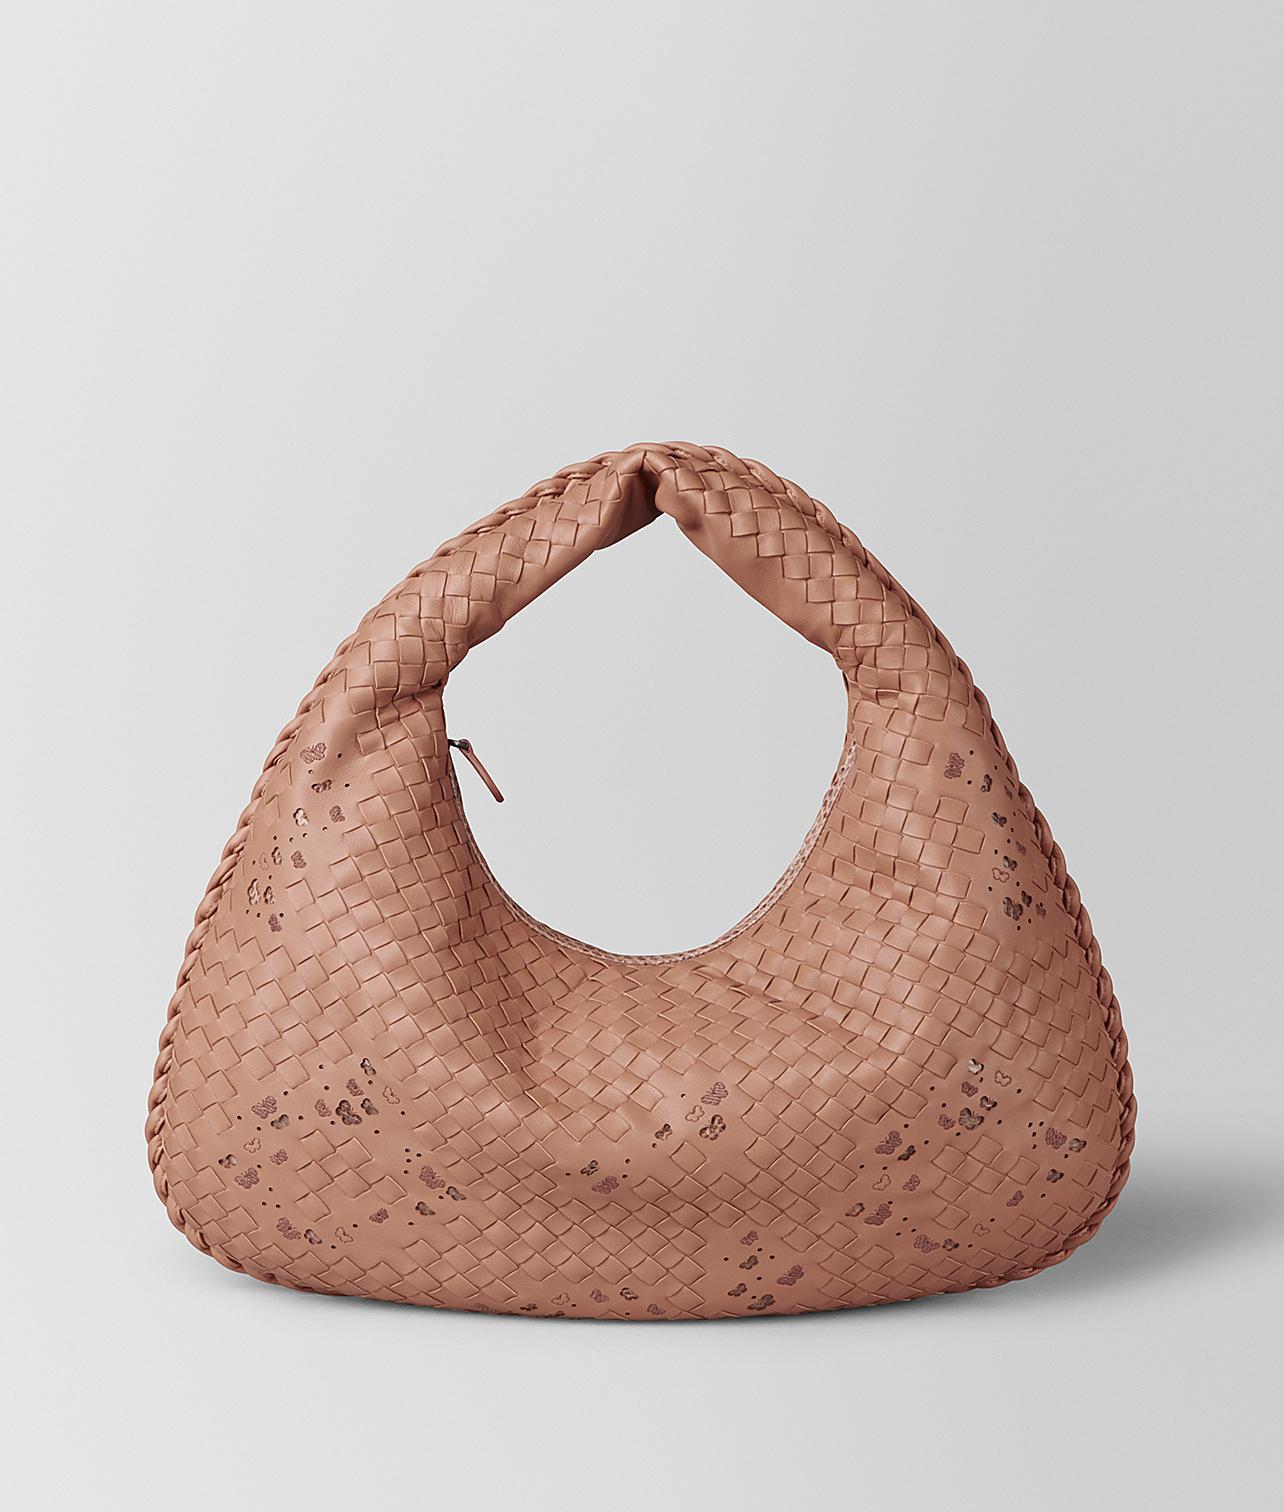 Bottega Veneta. Women s Dahlia Intrecciato Nappa Ayers Medium Veneta Bag e04d00a100e94